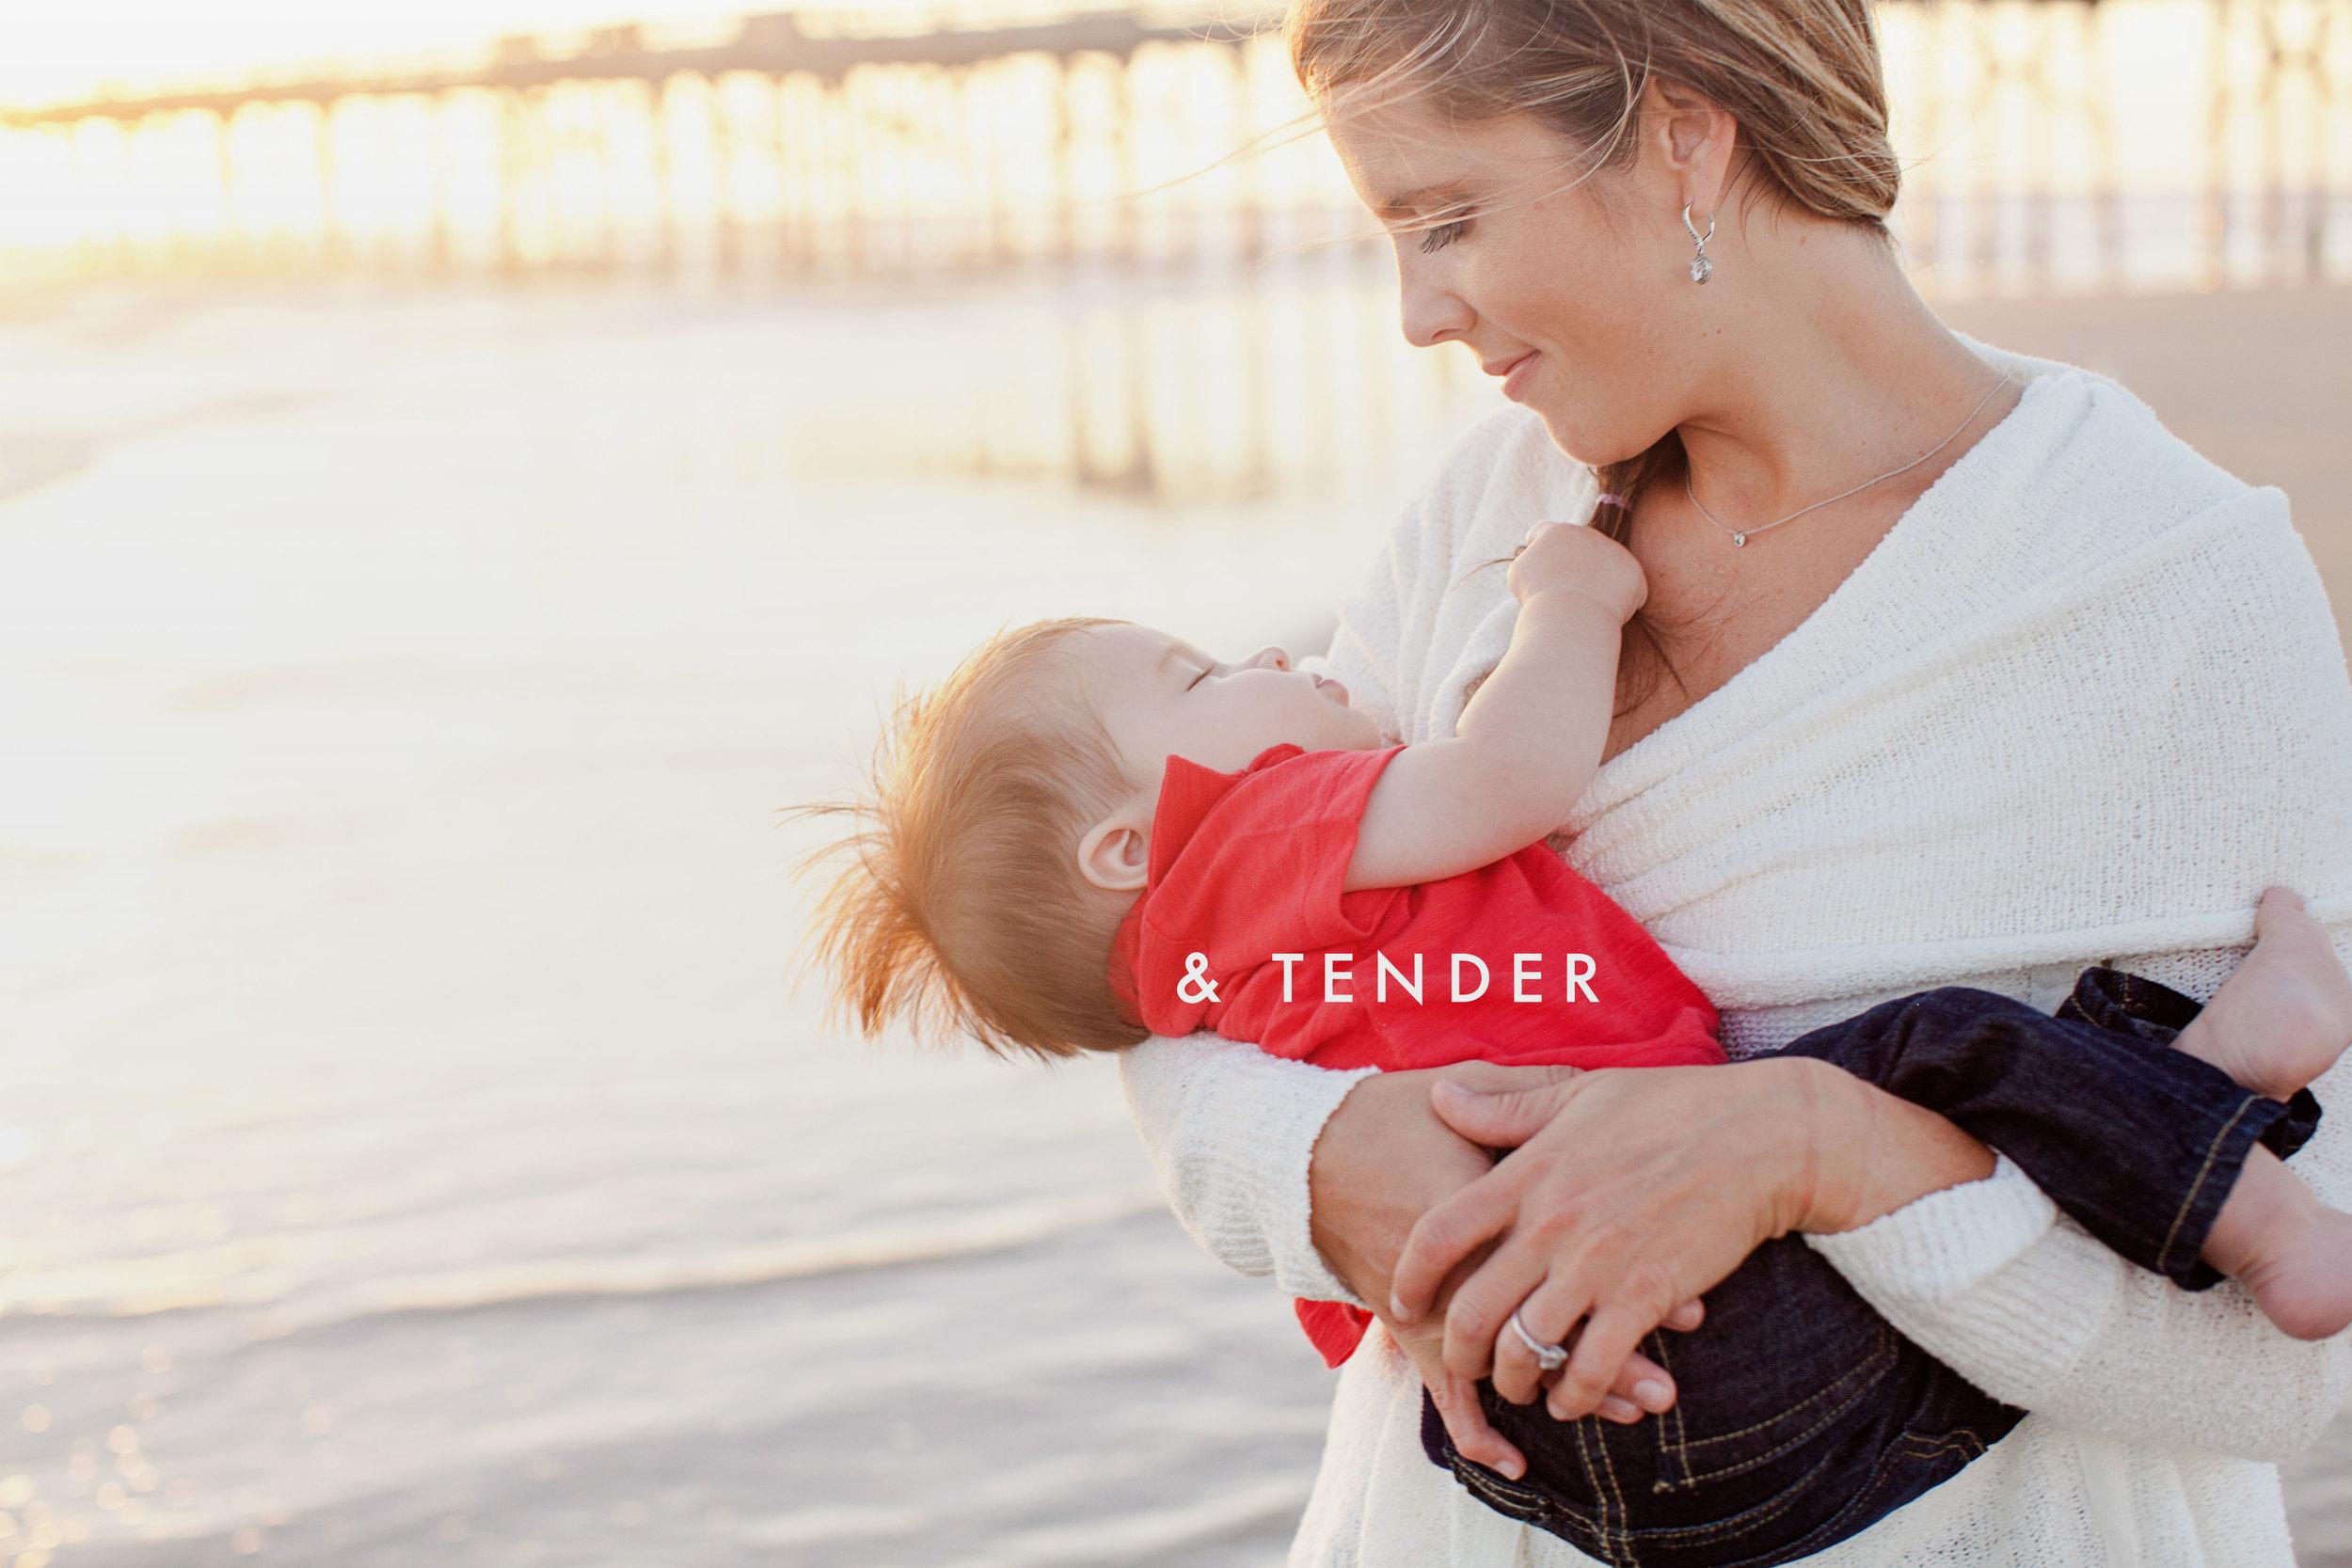 05_tender.jpg